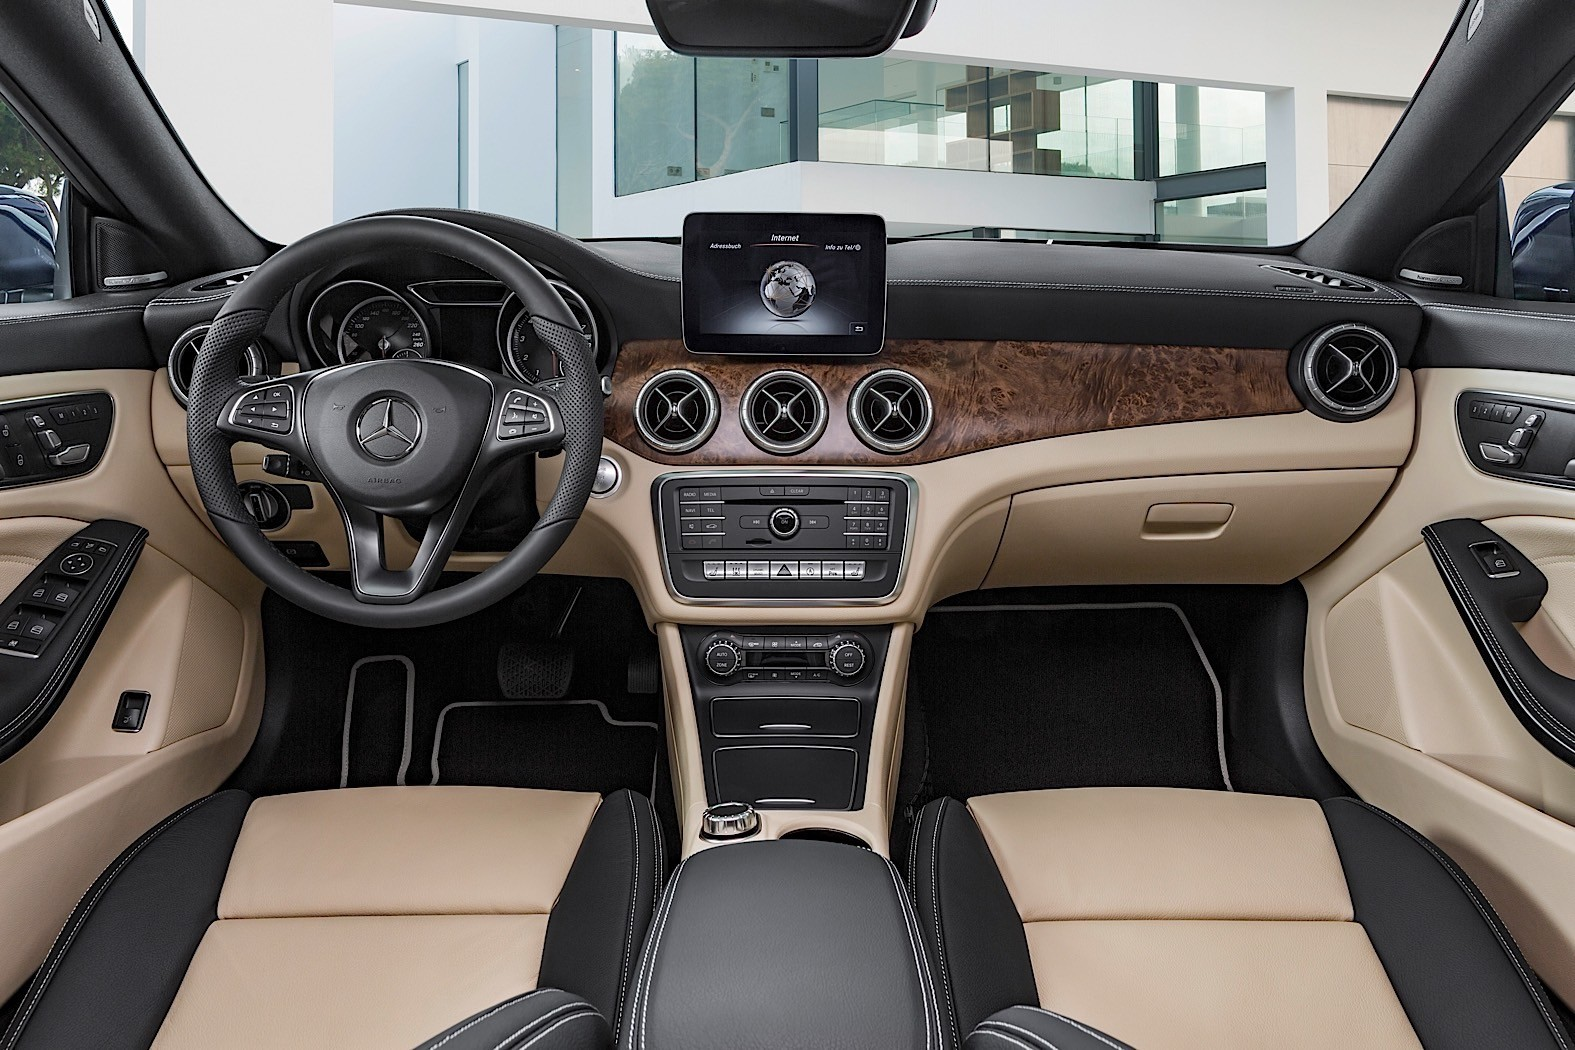 Mercedes CLA 45 AMG Pickup Is a Modern Chevrolet SSR  autoevolution